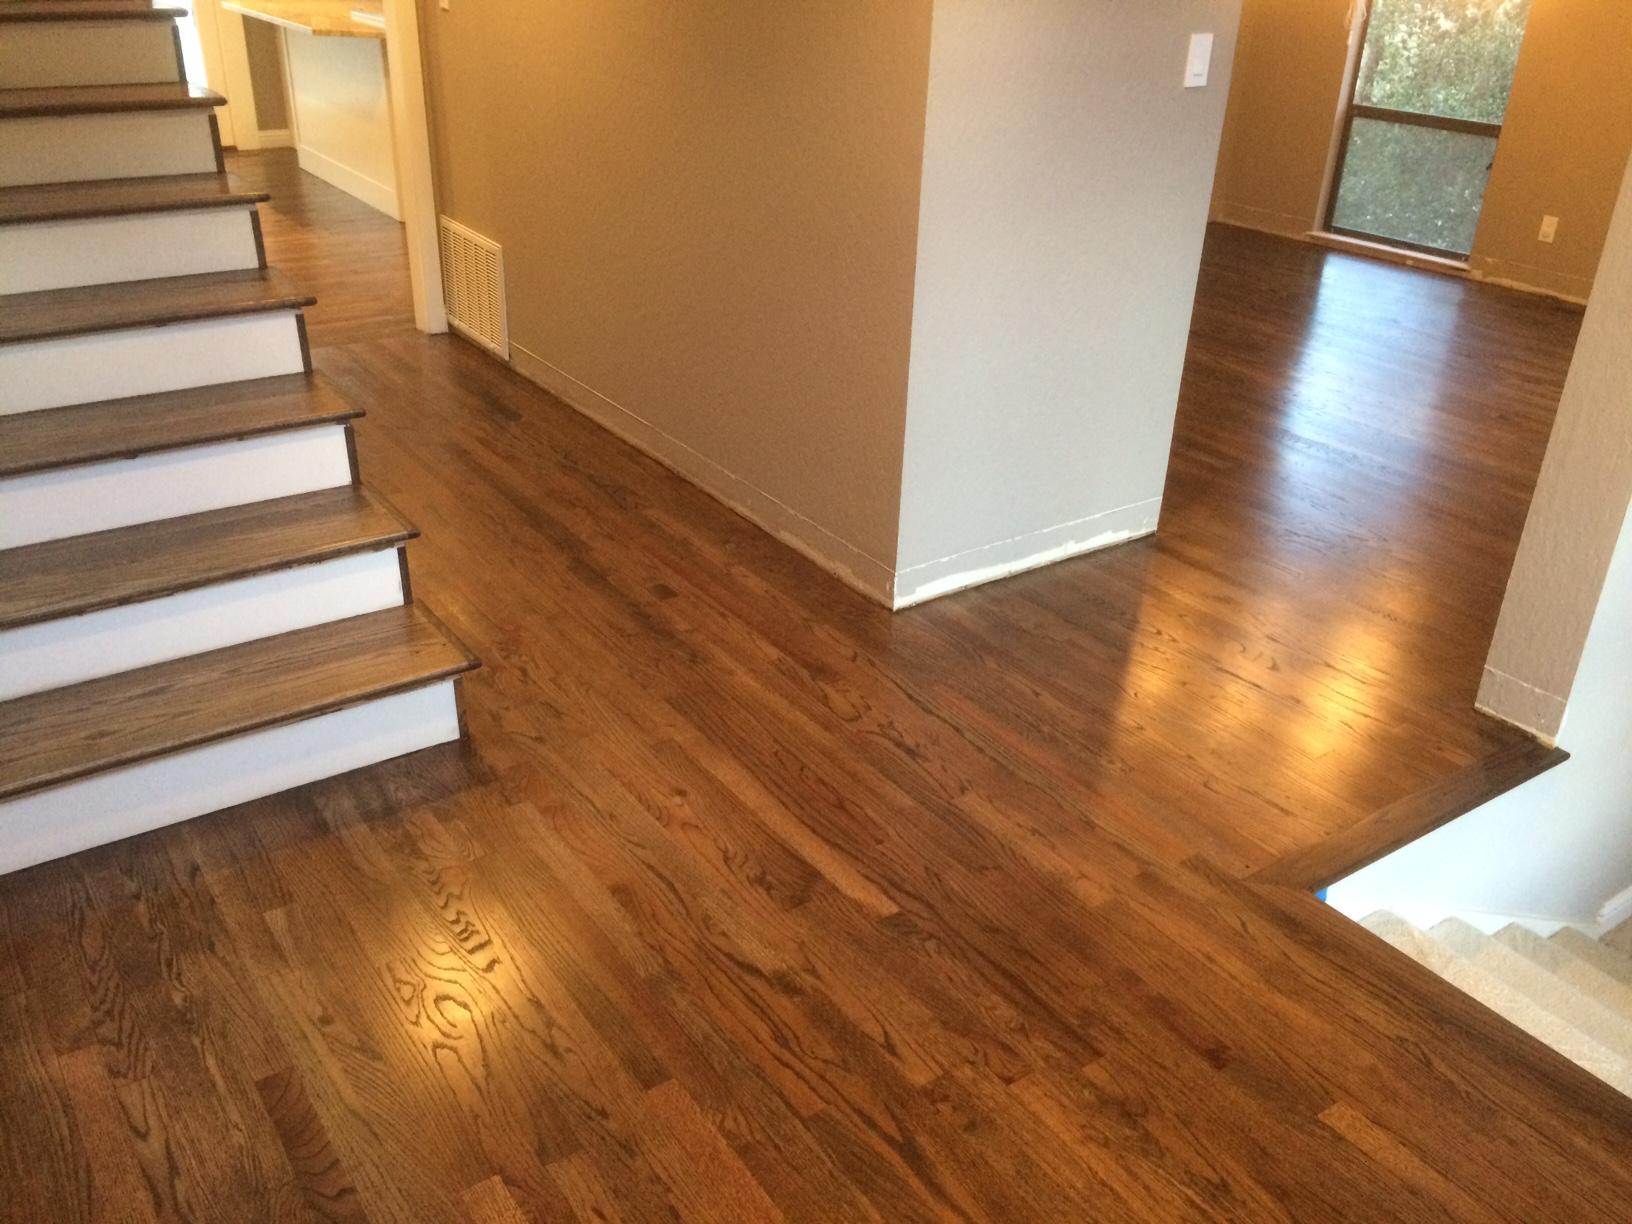 Gallery Avi S Hardwood Floors Inc